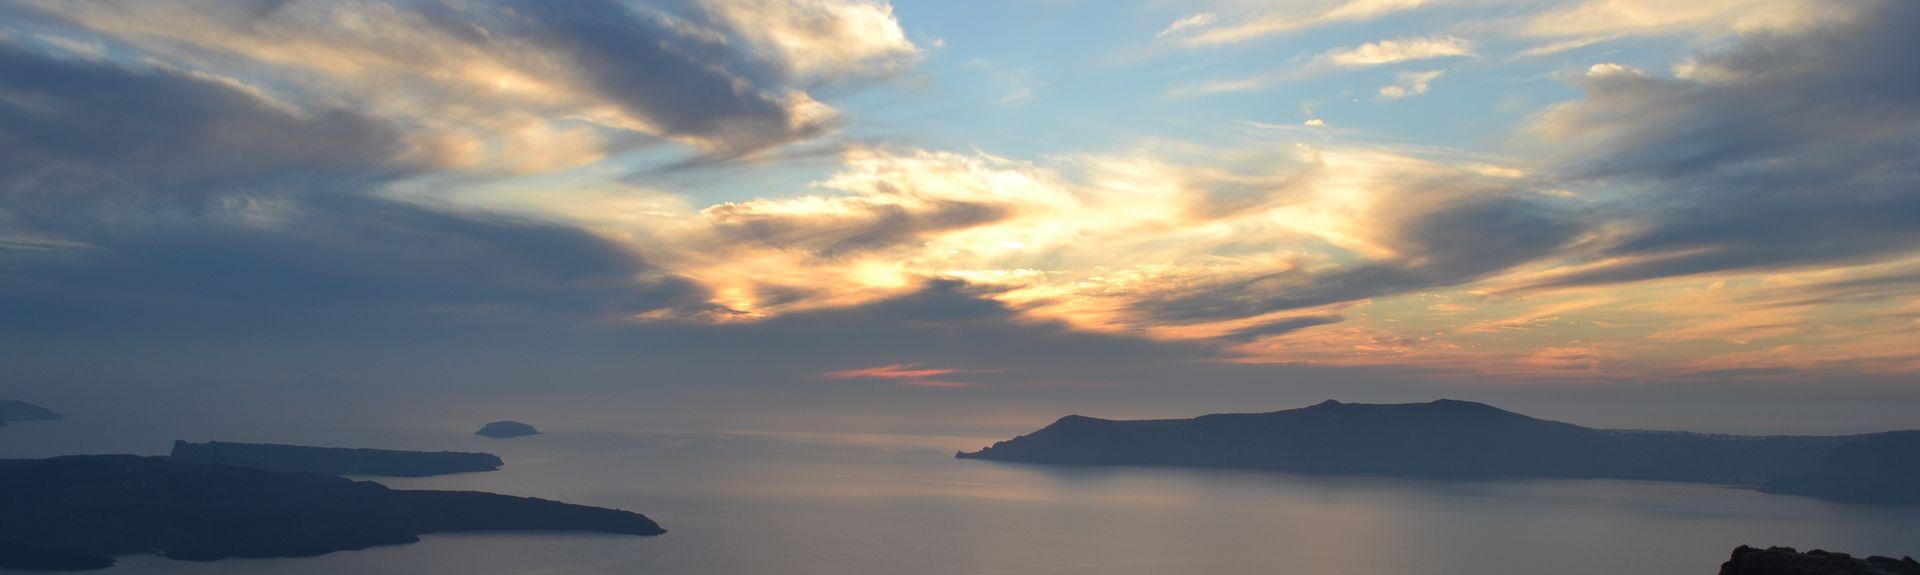 Pyrgos, Santorini, Egeu Meridional, Grécia